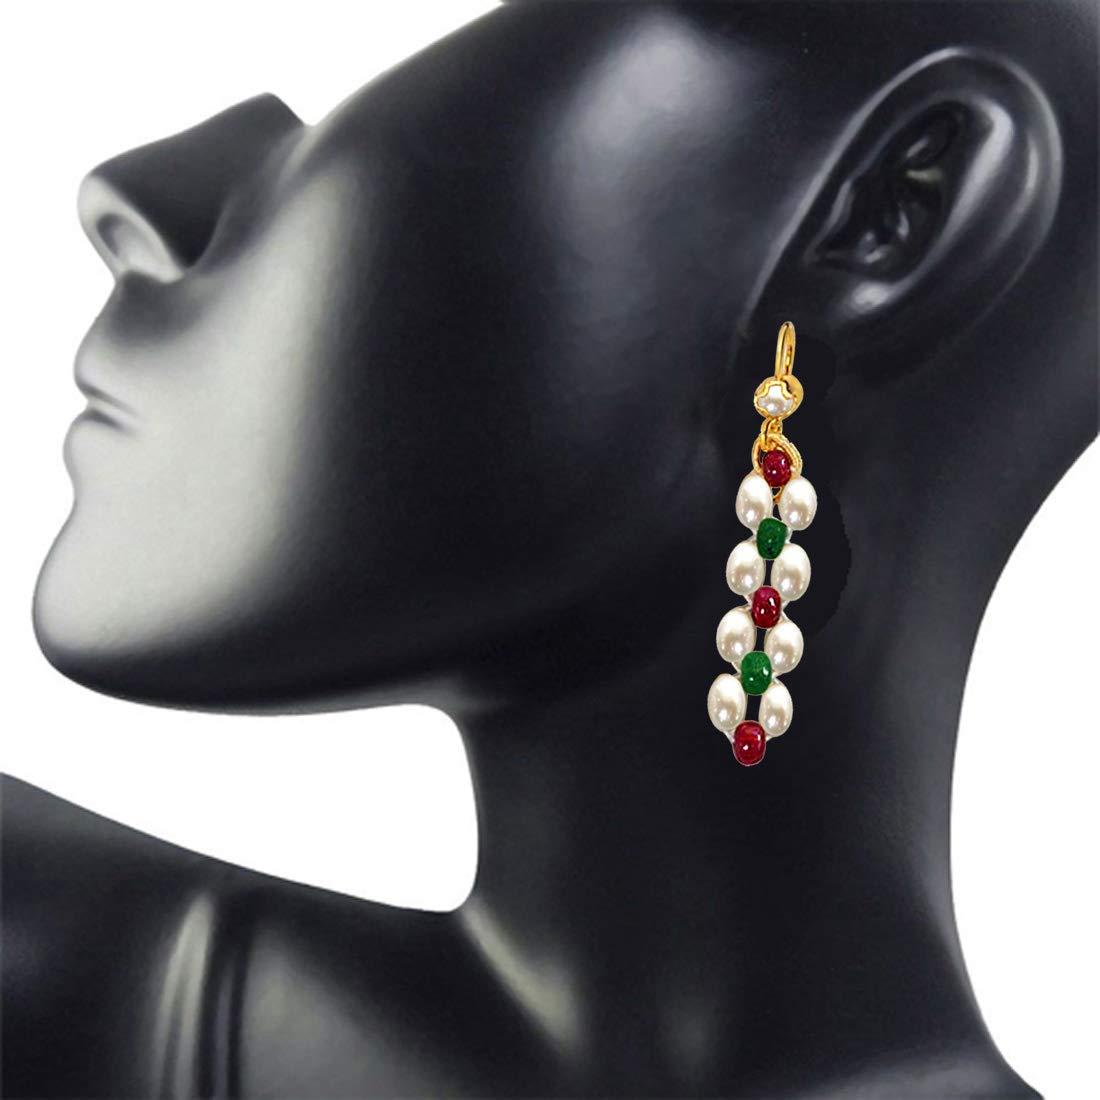 Dangling Rice Pearl, Ruby & Emerald Beads Earrings for Women (SE124)